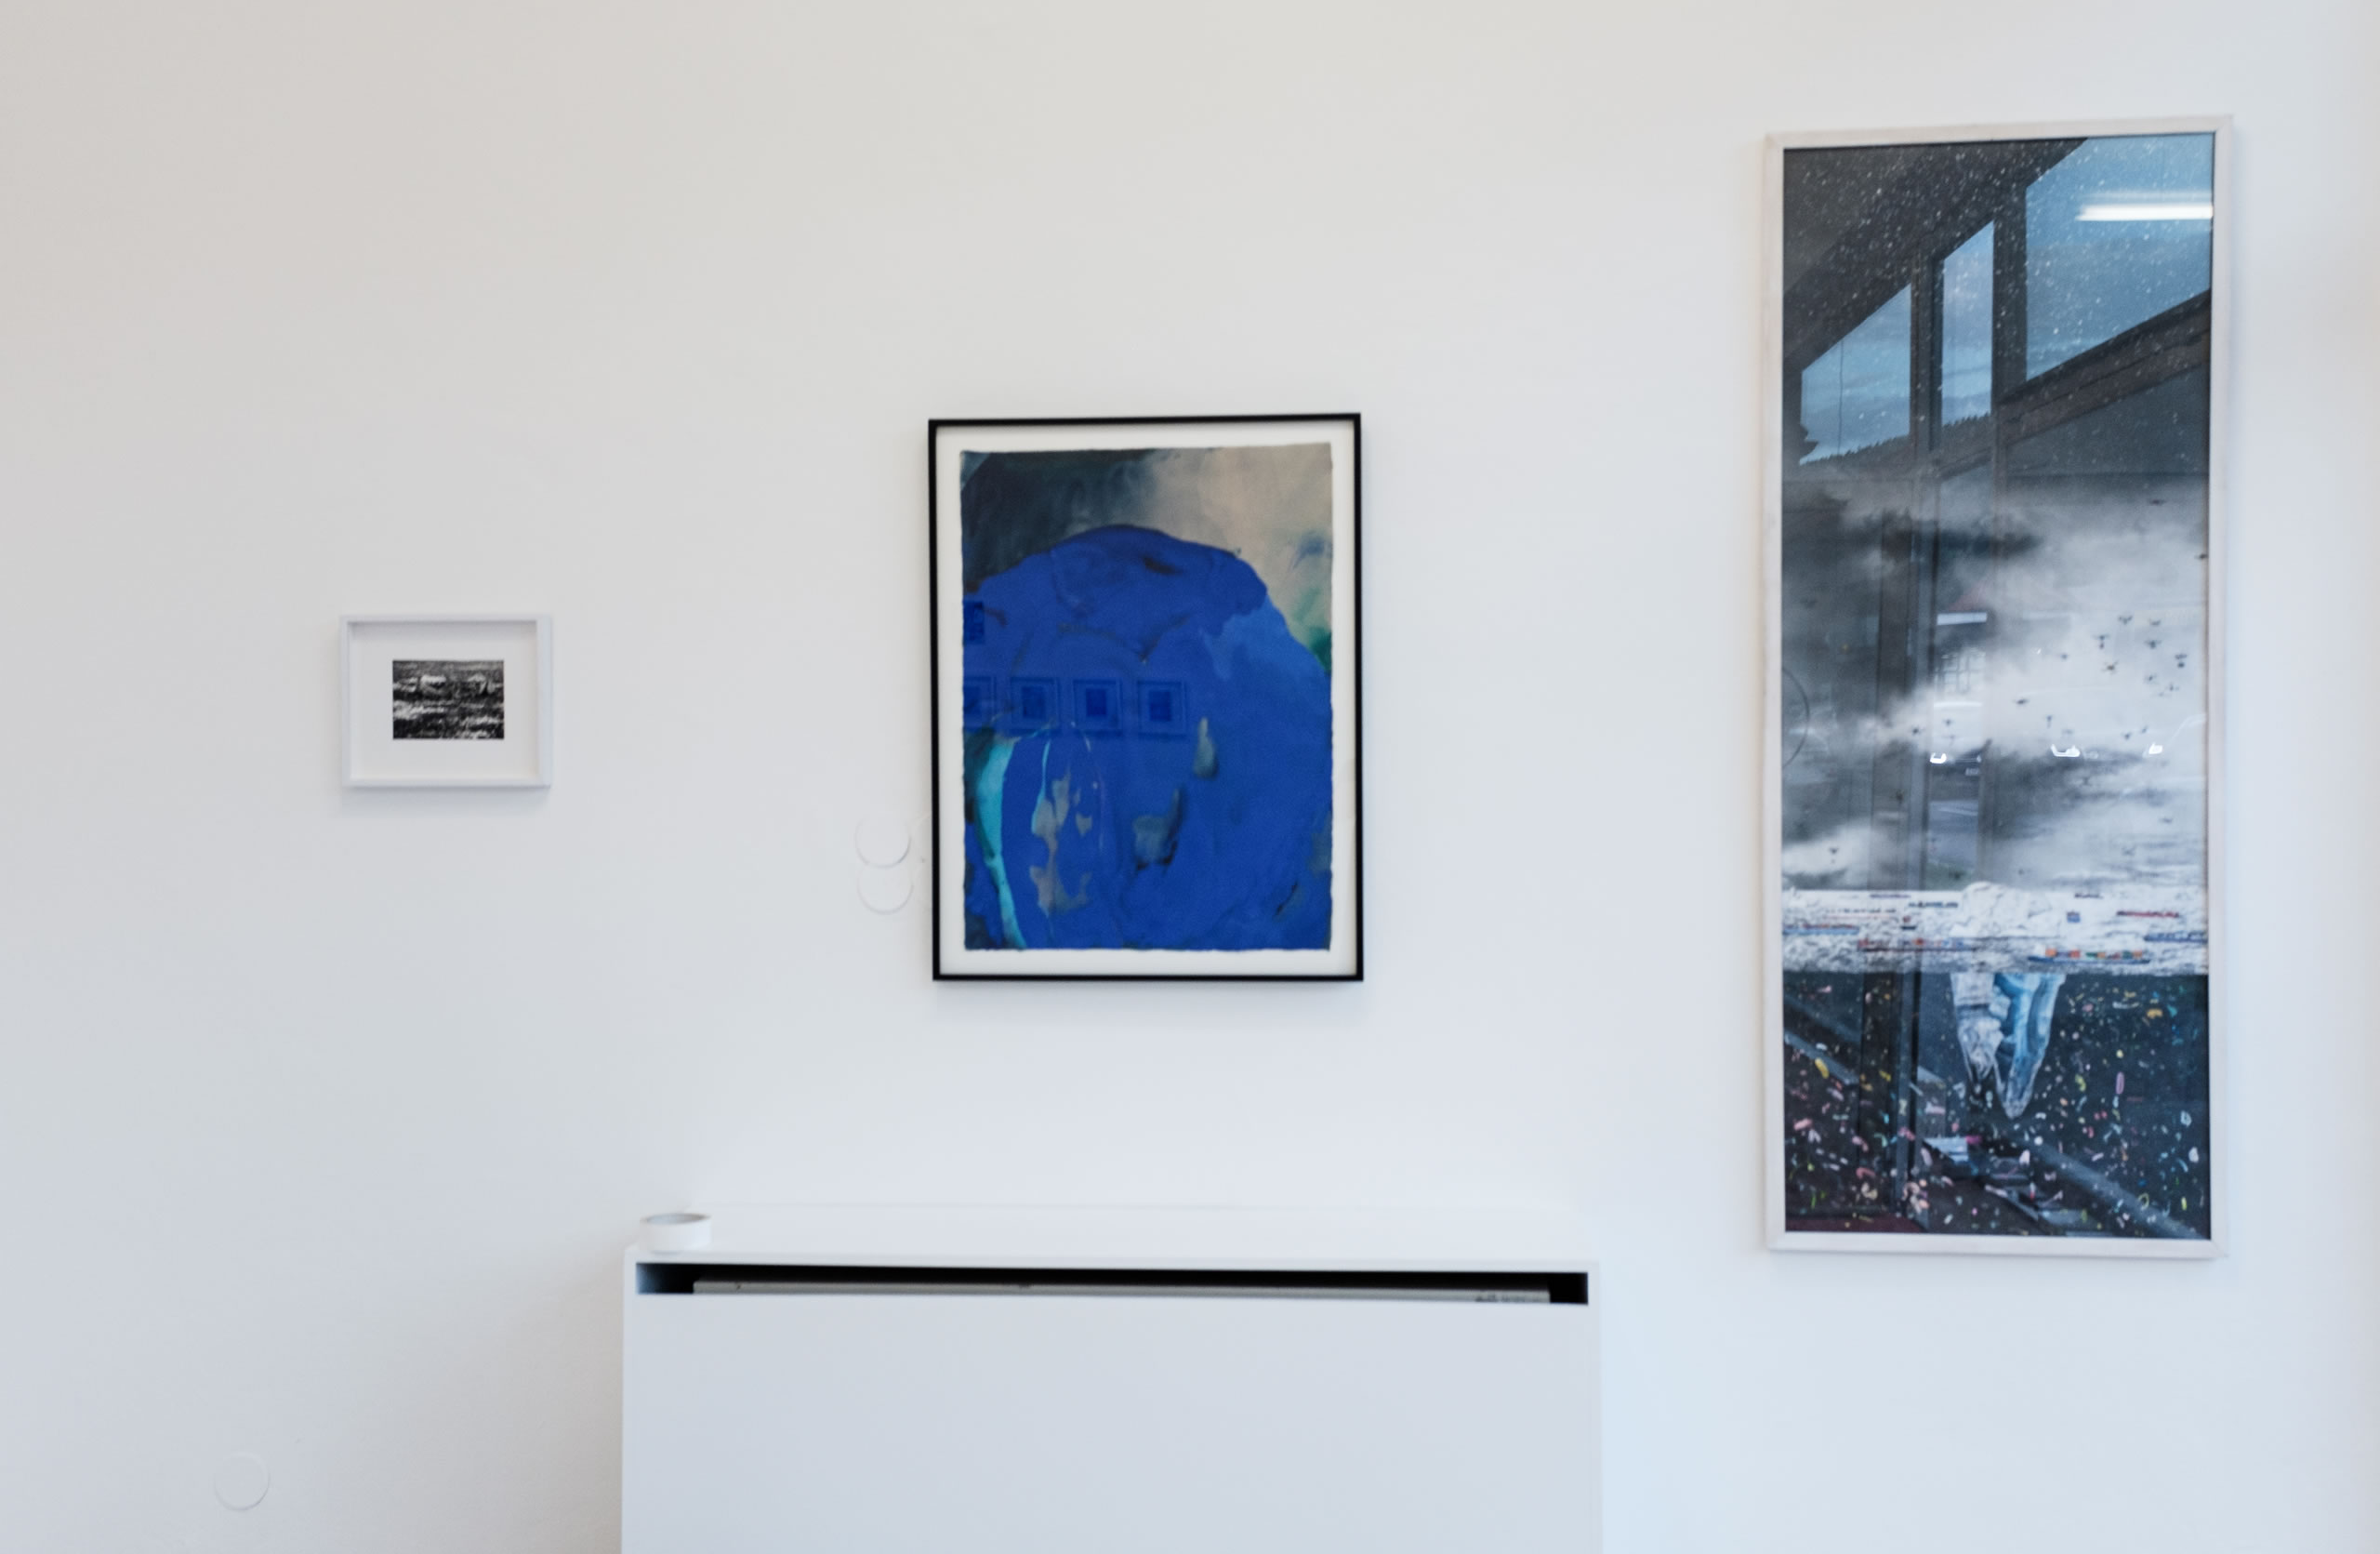 3. Törn | Veronika Dirnhofer | Margot Pilz | Payer-Gabriel | Foto Manu Lasnik | 2019 | Galerie3